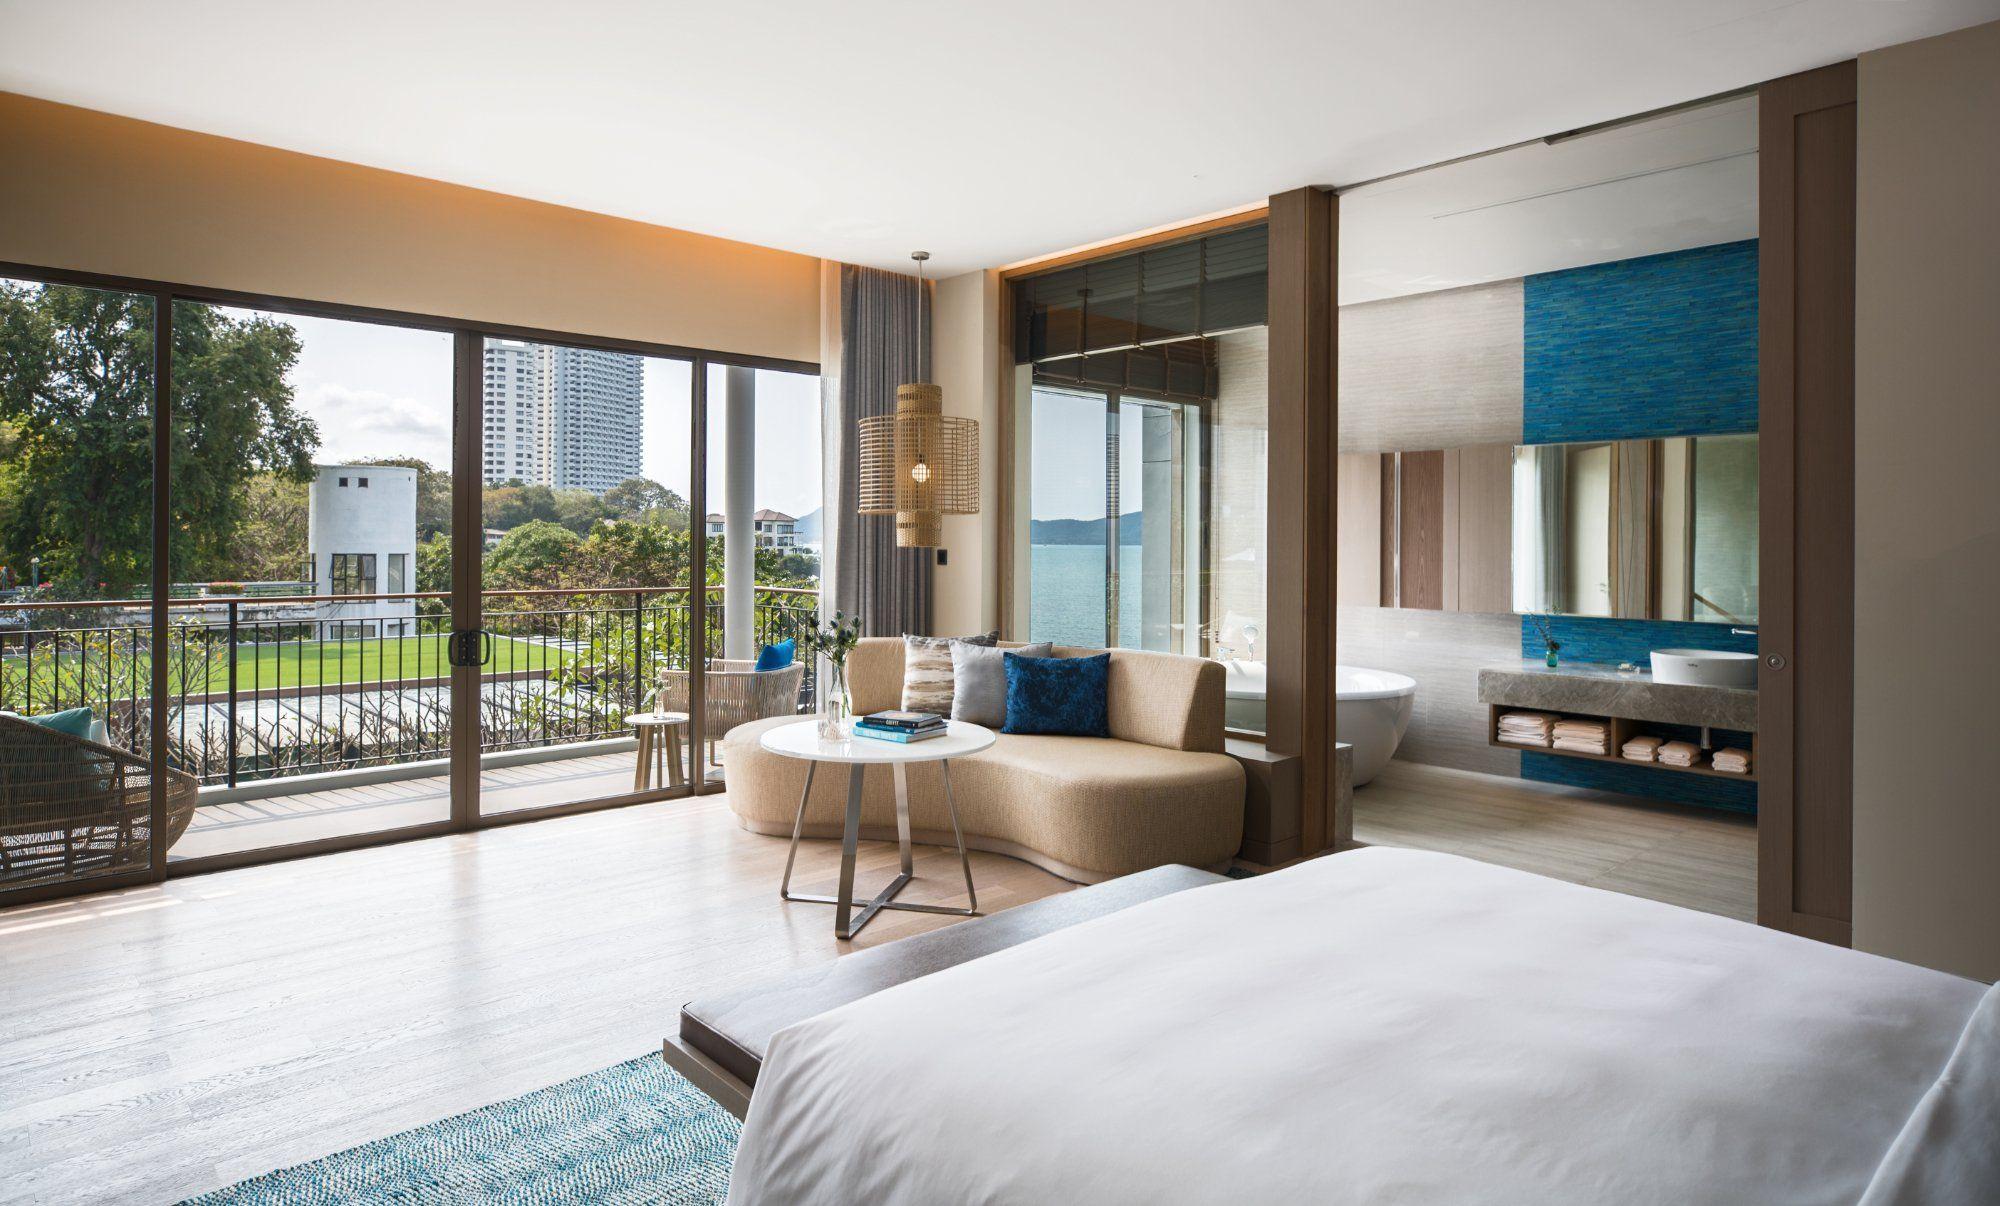 Renaissance Pattaya Resort & Spa: UPDATED 2018 Reviews